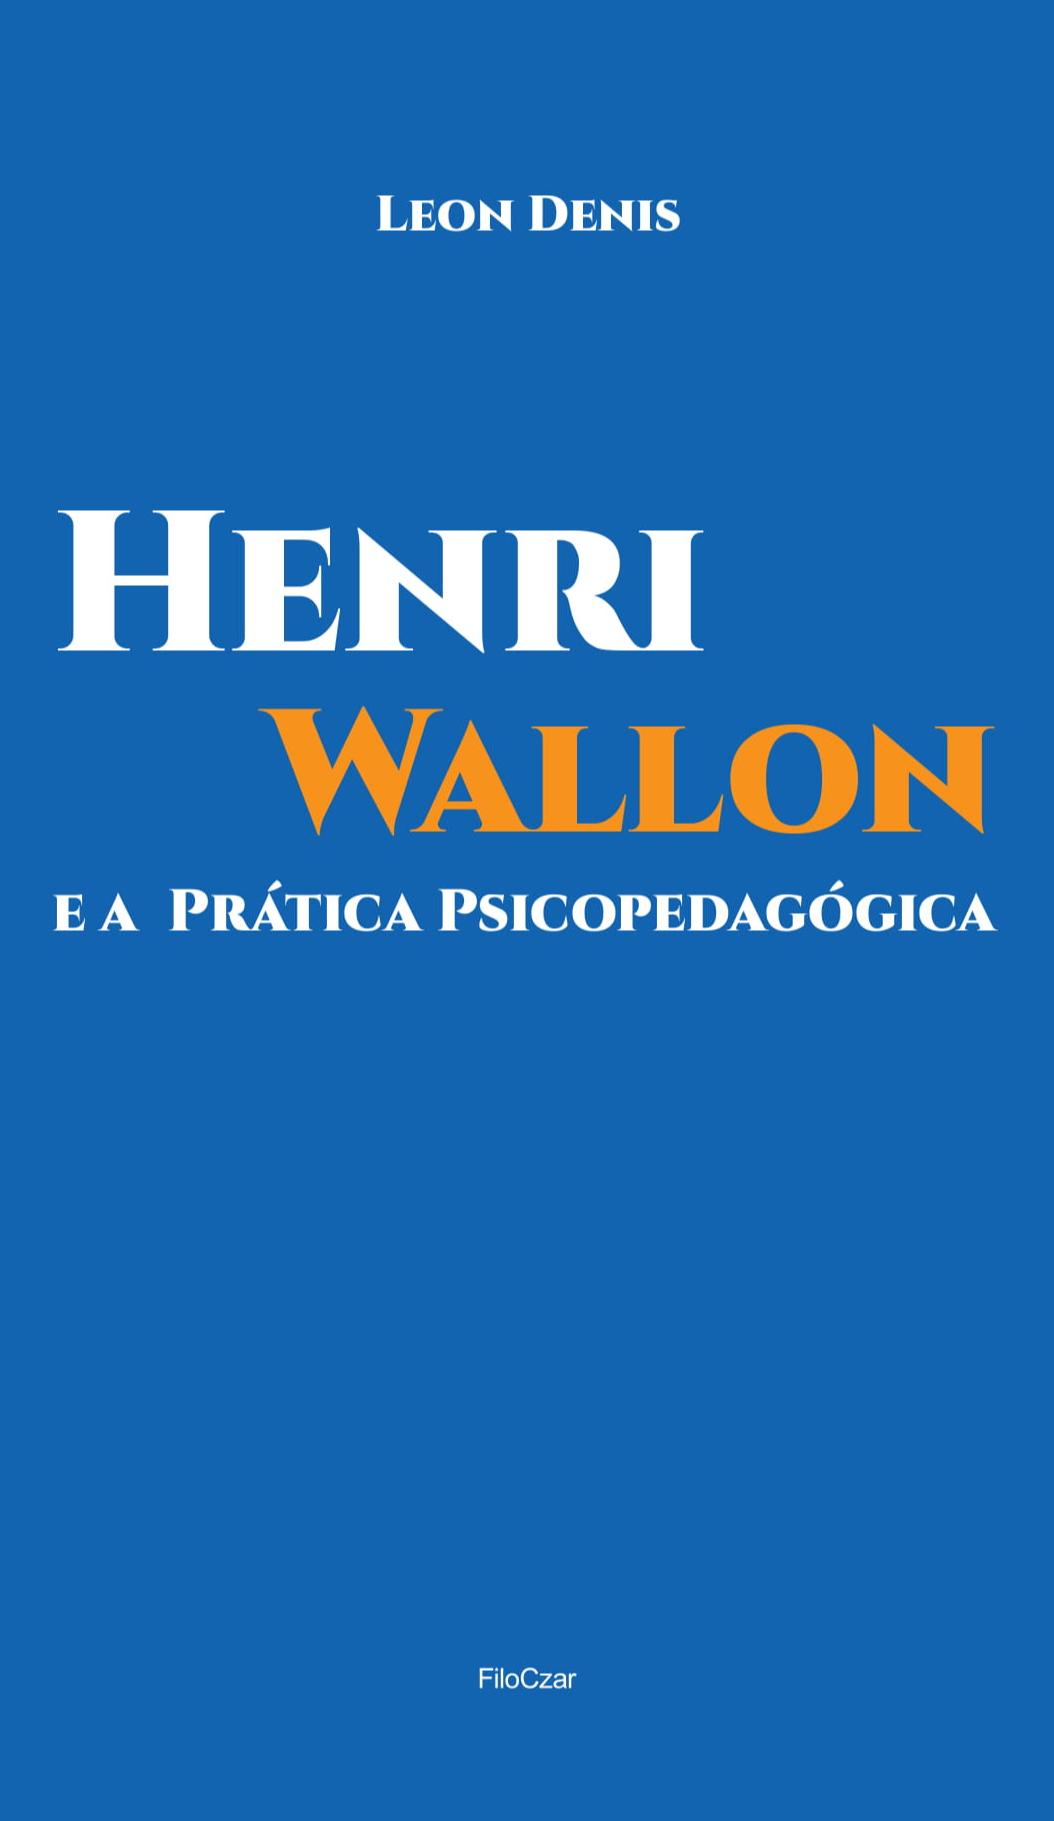 Henri Wallon e a Prática Psicopedagógica